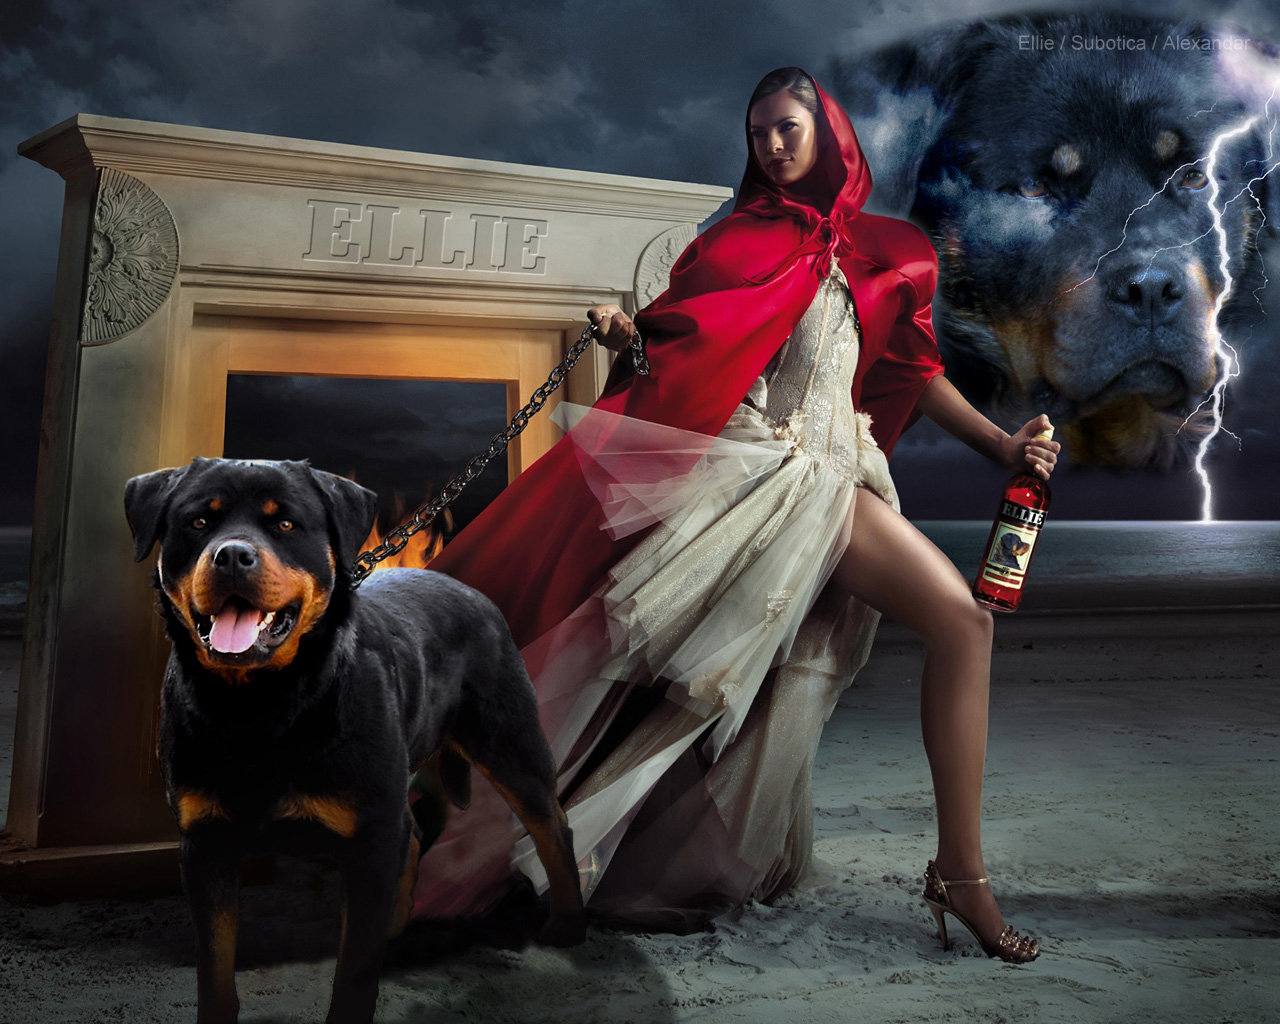 Rottweiler full movie free